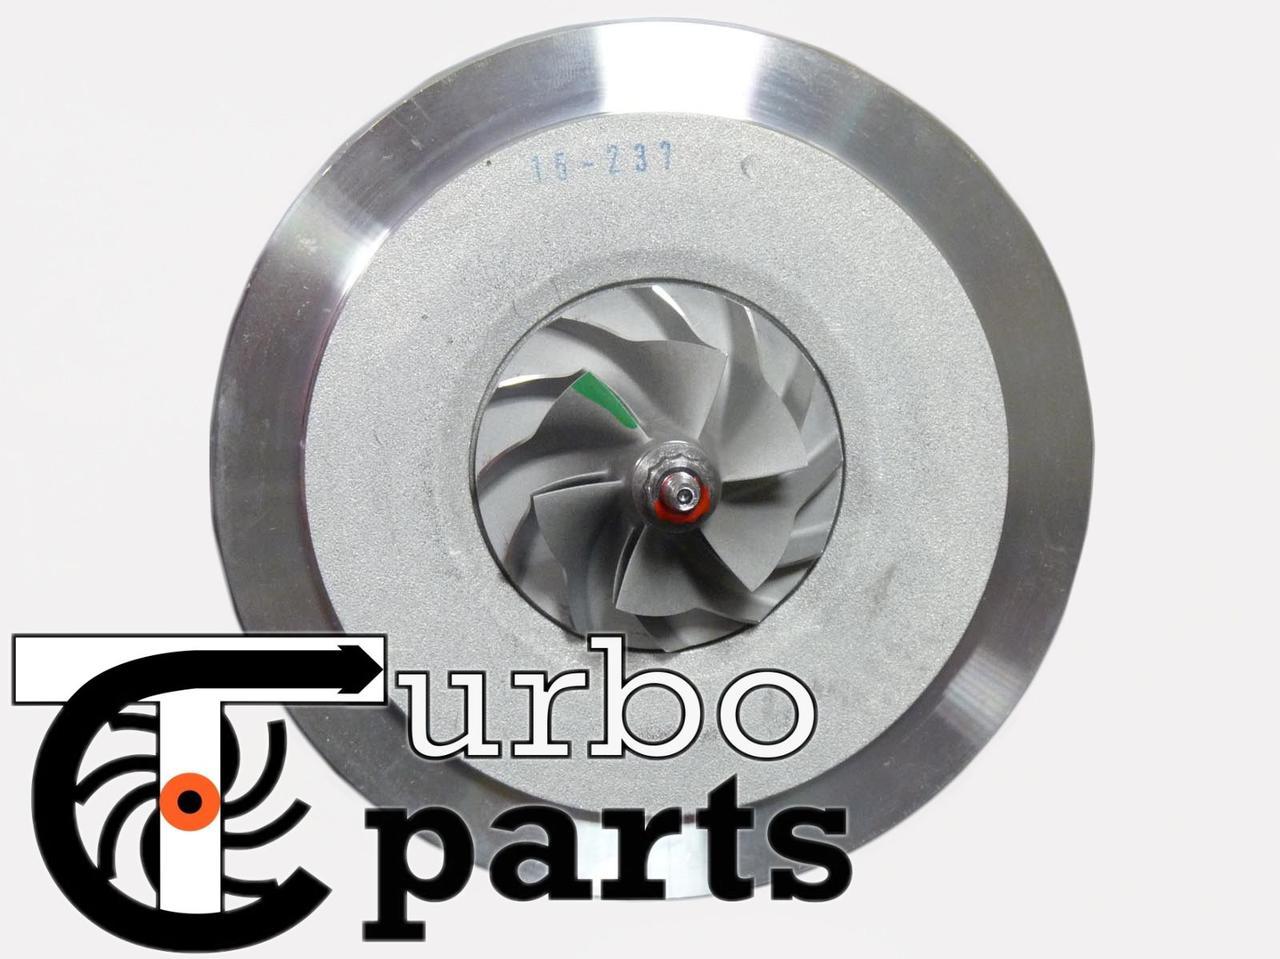 Картридж турбины Citroen 1.9TD Xantia/ Xsara от 1996 г.в. 454171-0004, 454171-0005, 454176-0005